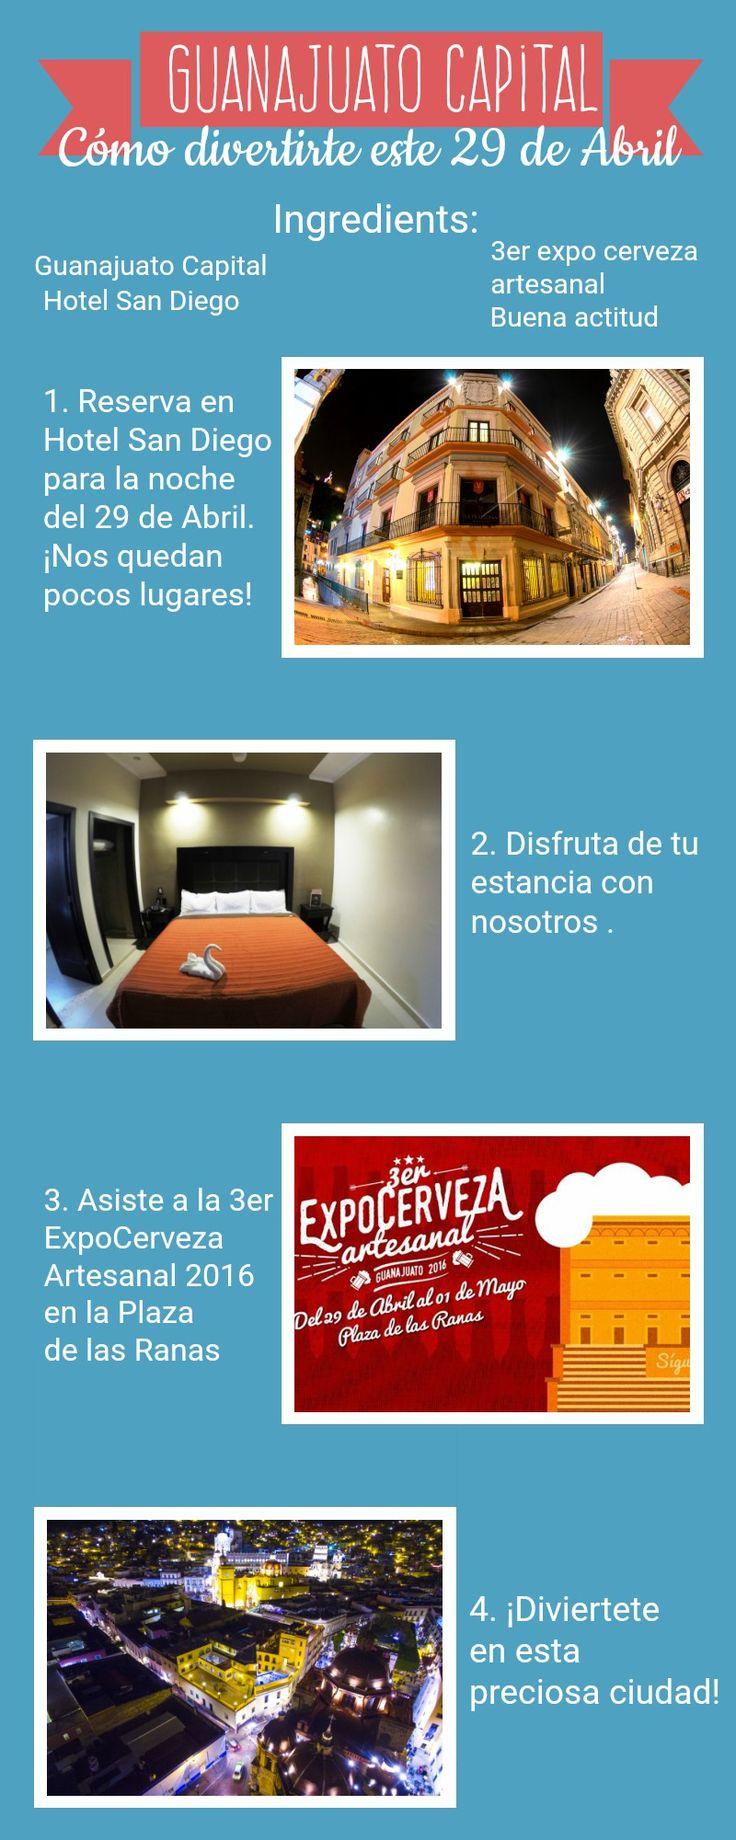 Se viene la 3er Expo Cerveza Artesanal en Guanajuato Capital, HOSPEDATE EN HOTEL SAN DIEGO GTO